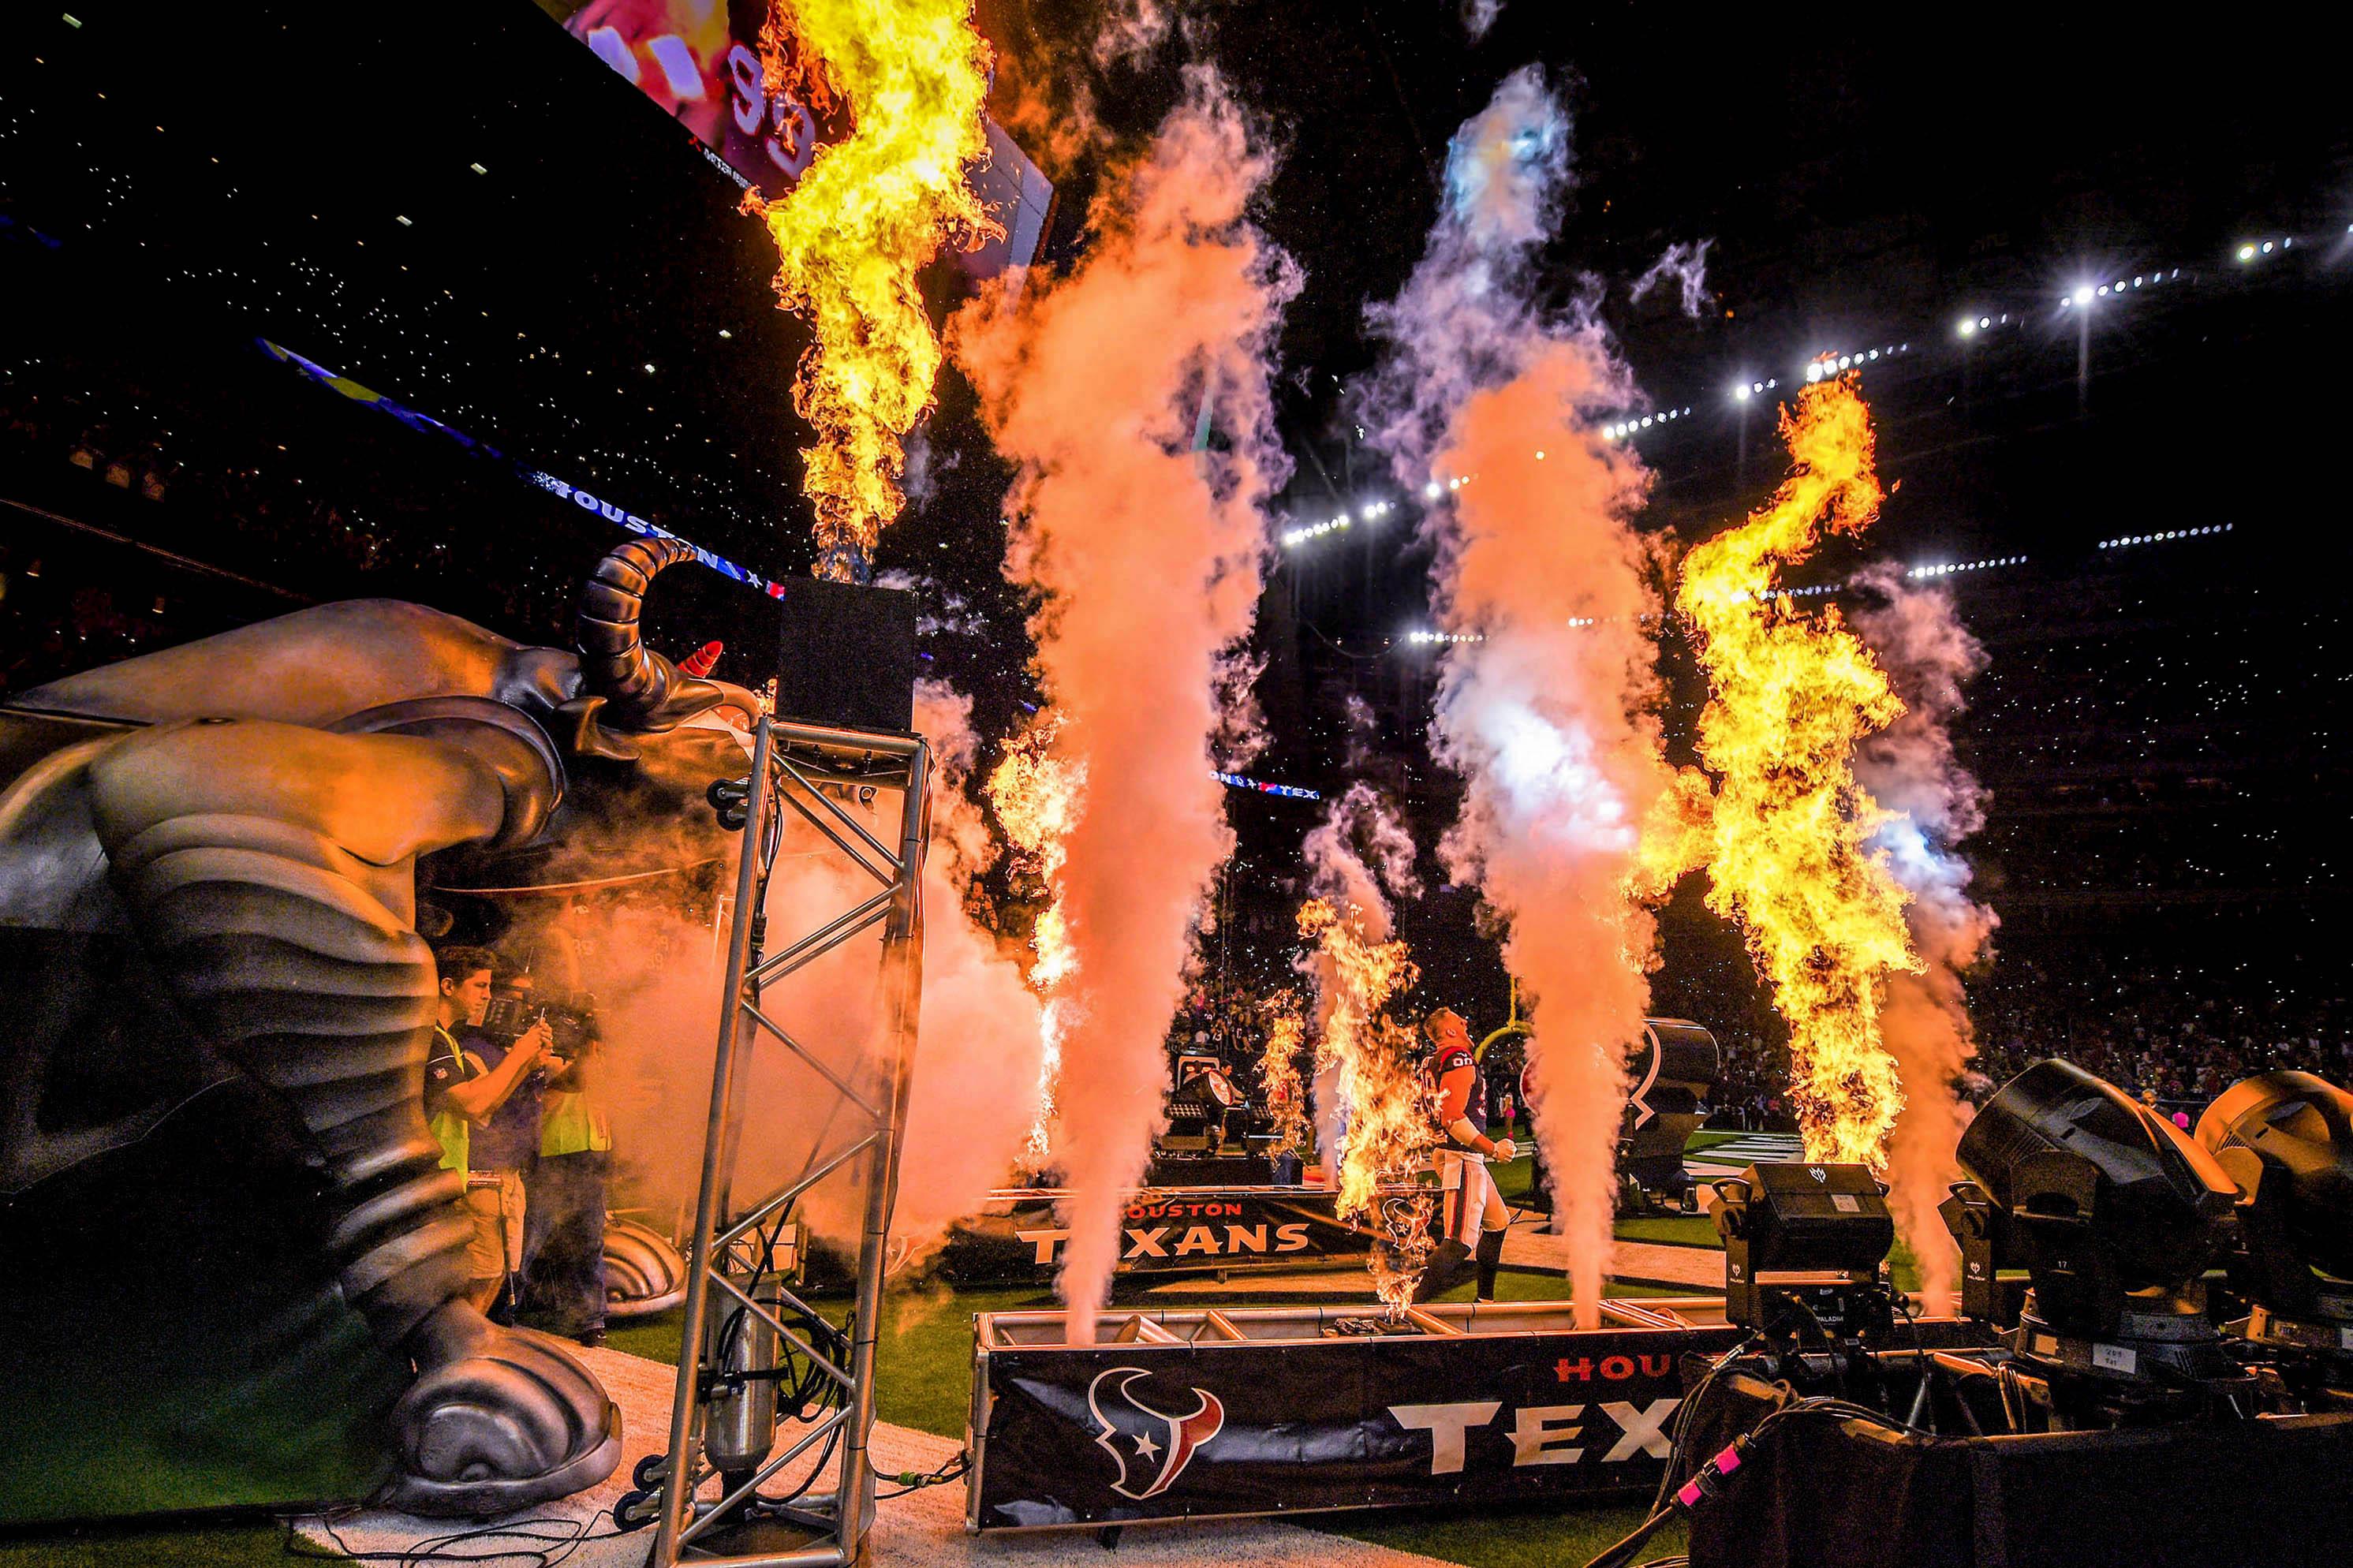 NFL: Kansas City Chiefs at Houston Texans